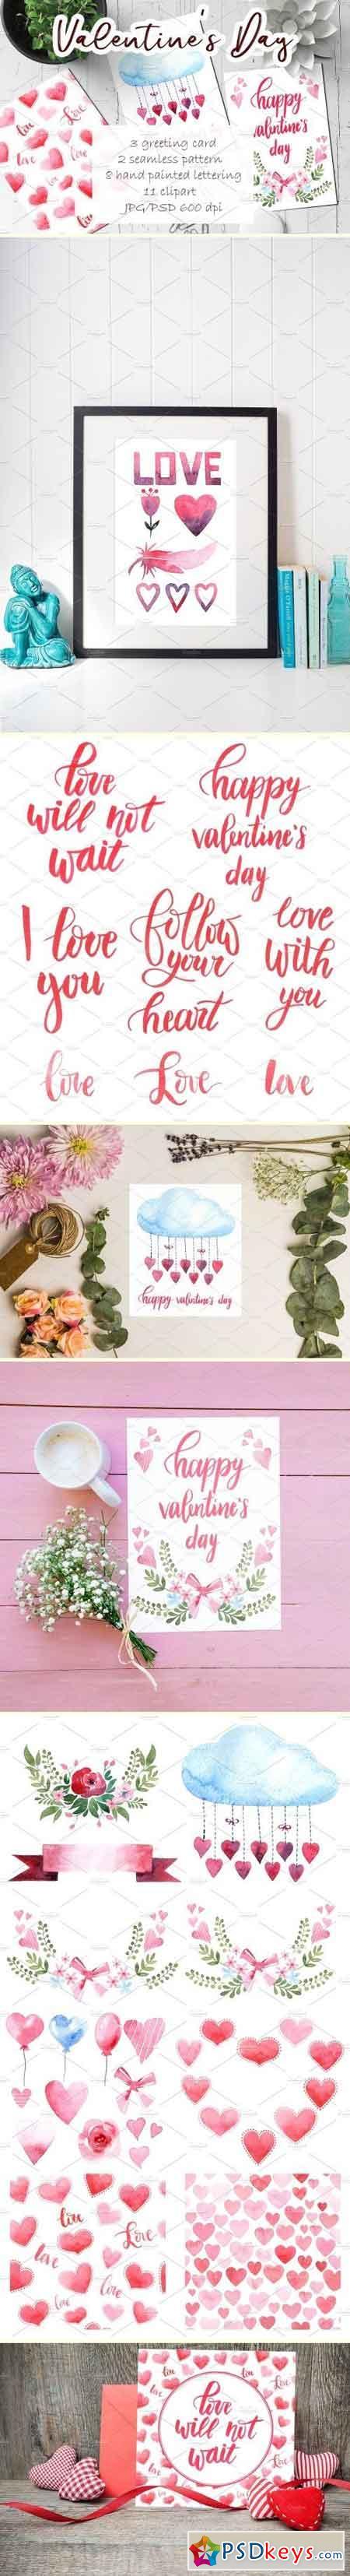 Watercolor set - Valentine's Day 2128418